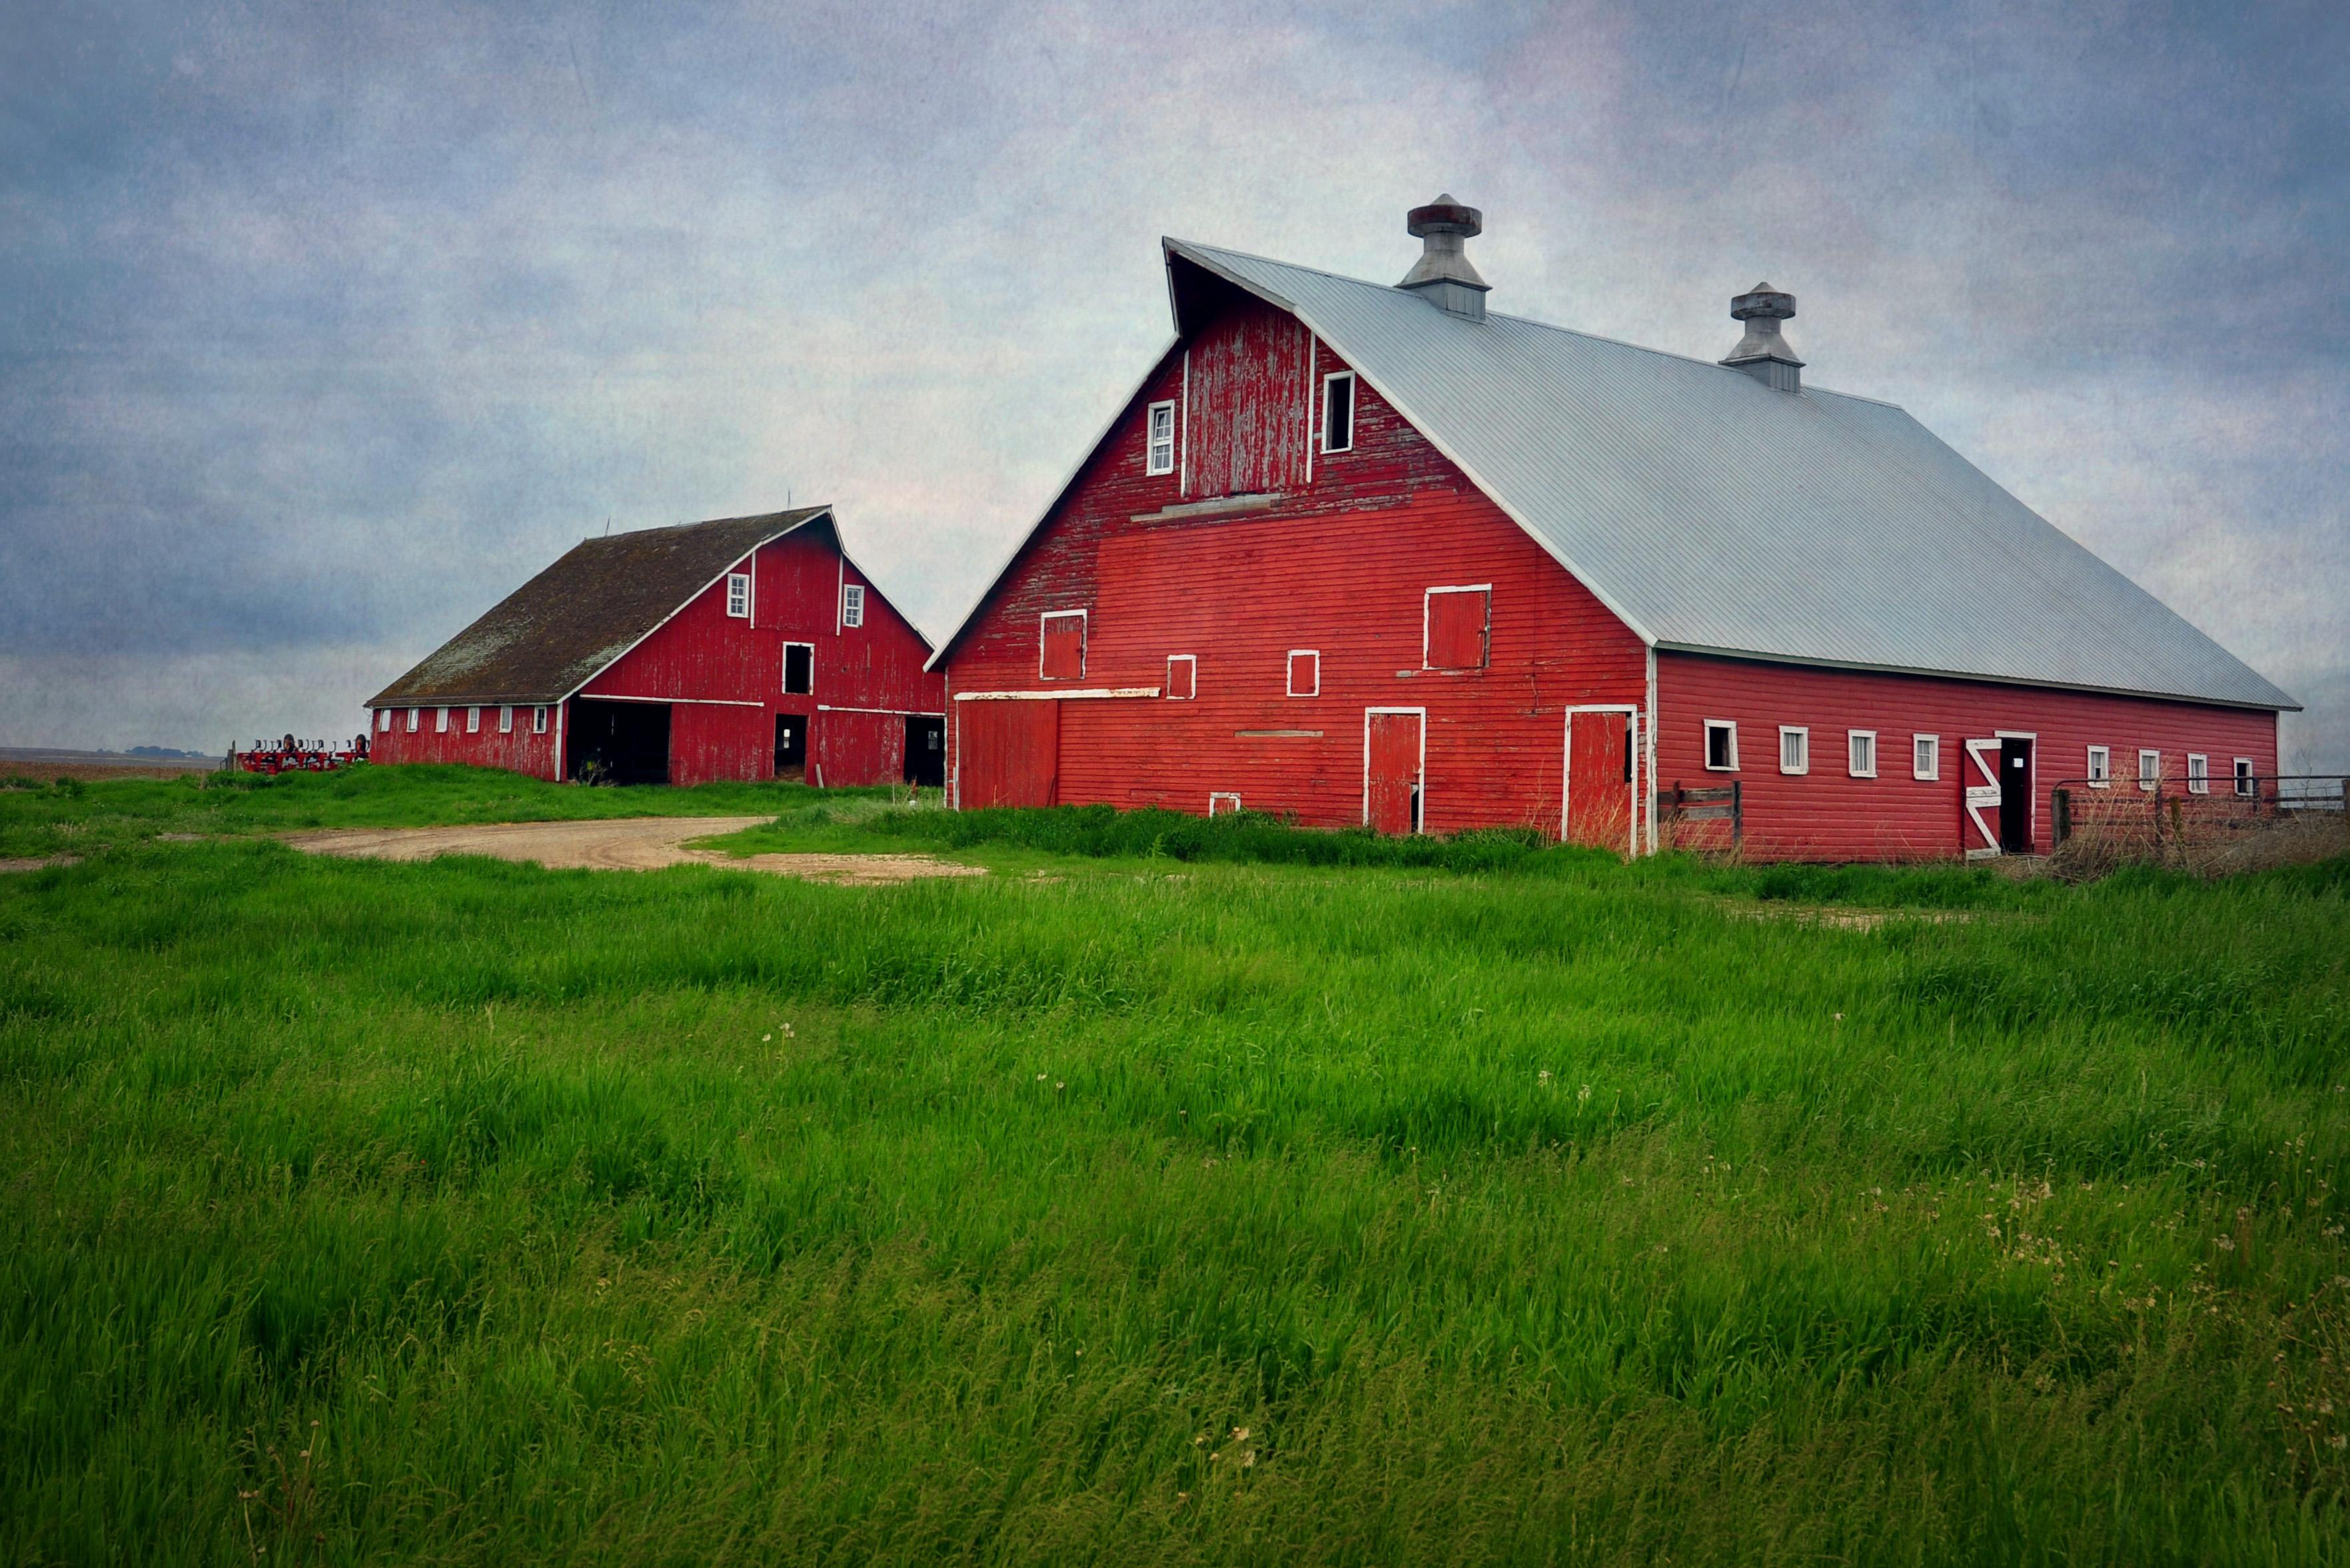 Two Barns Flickr Photo Sharing